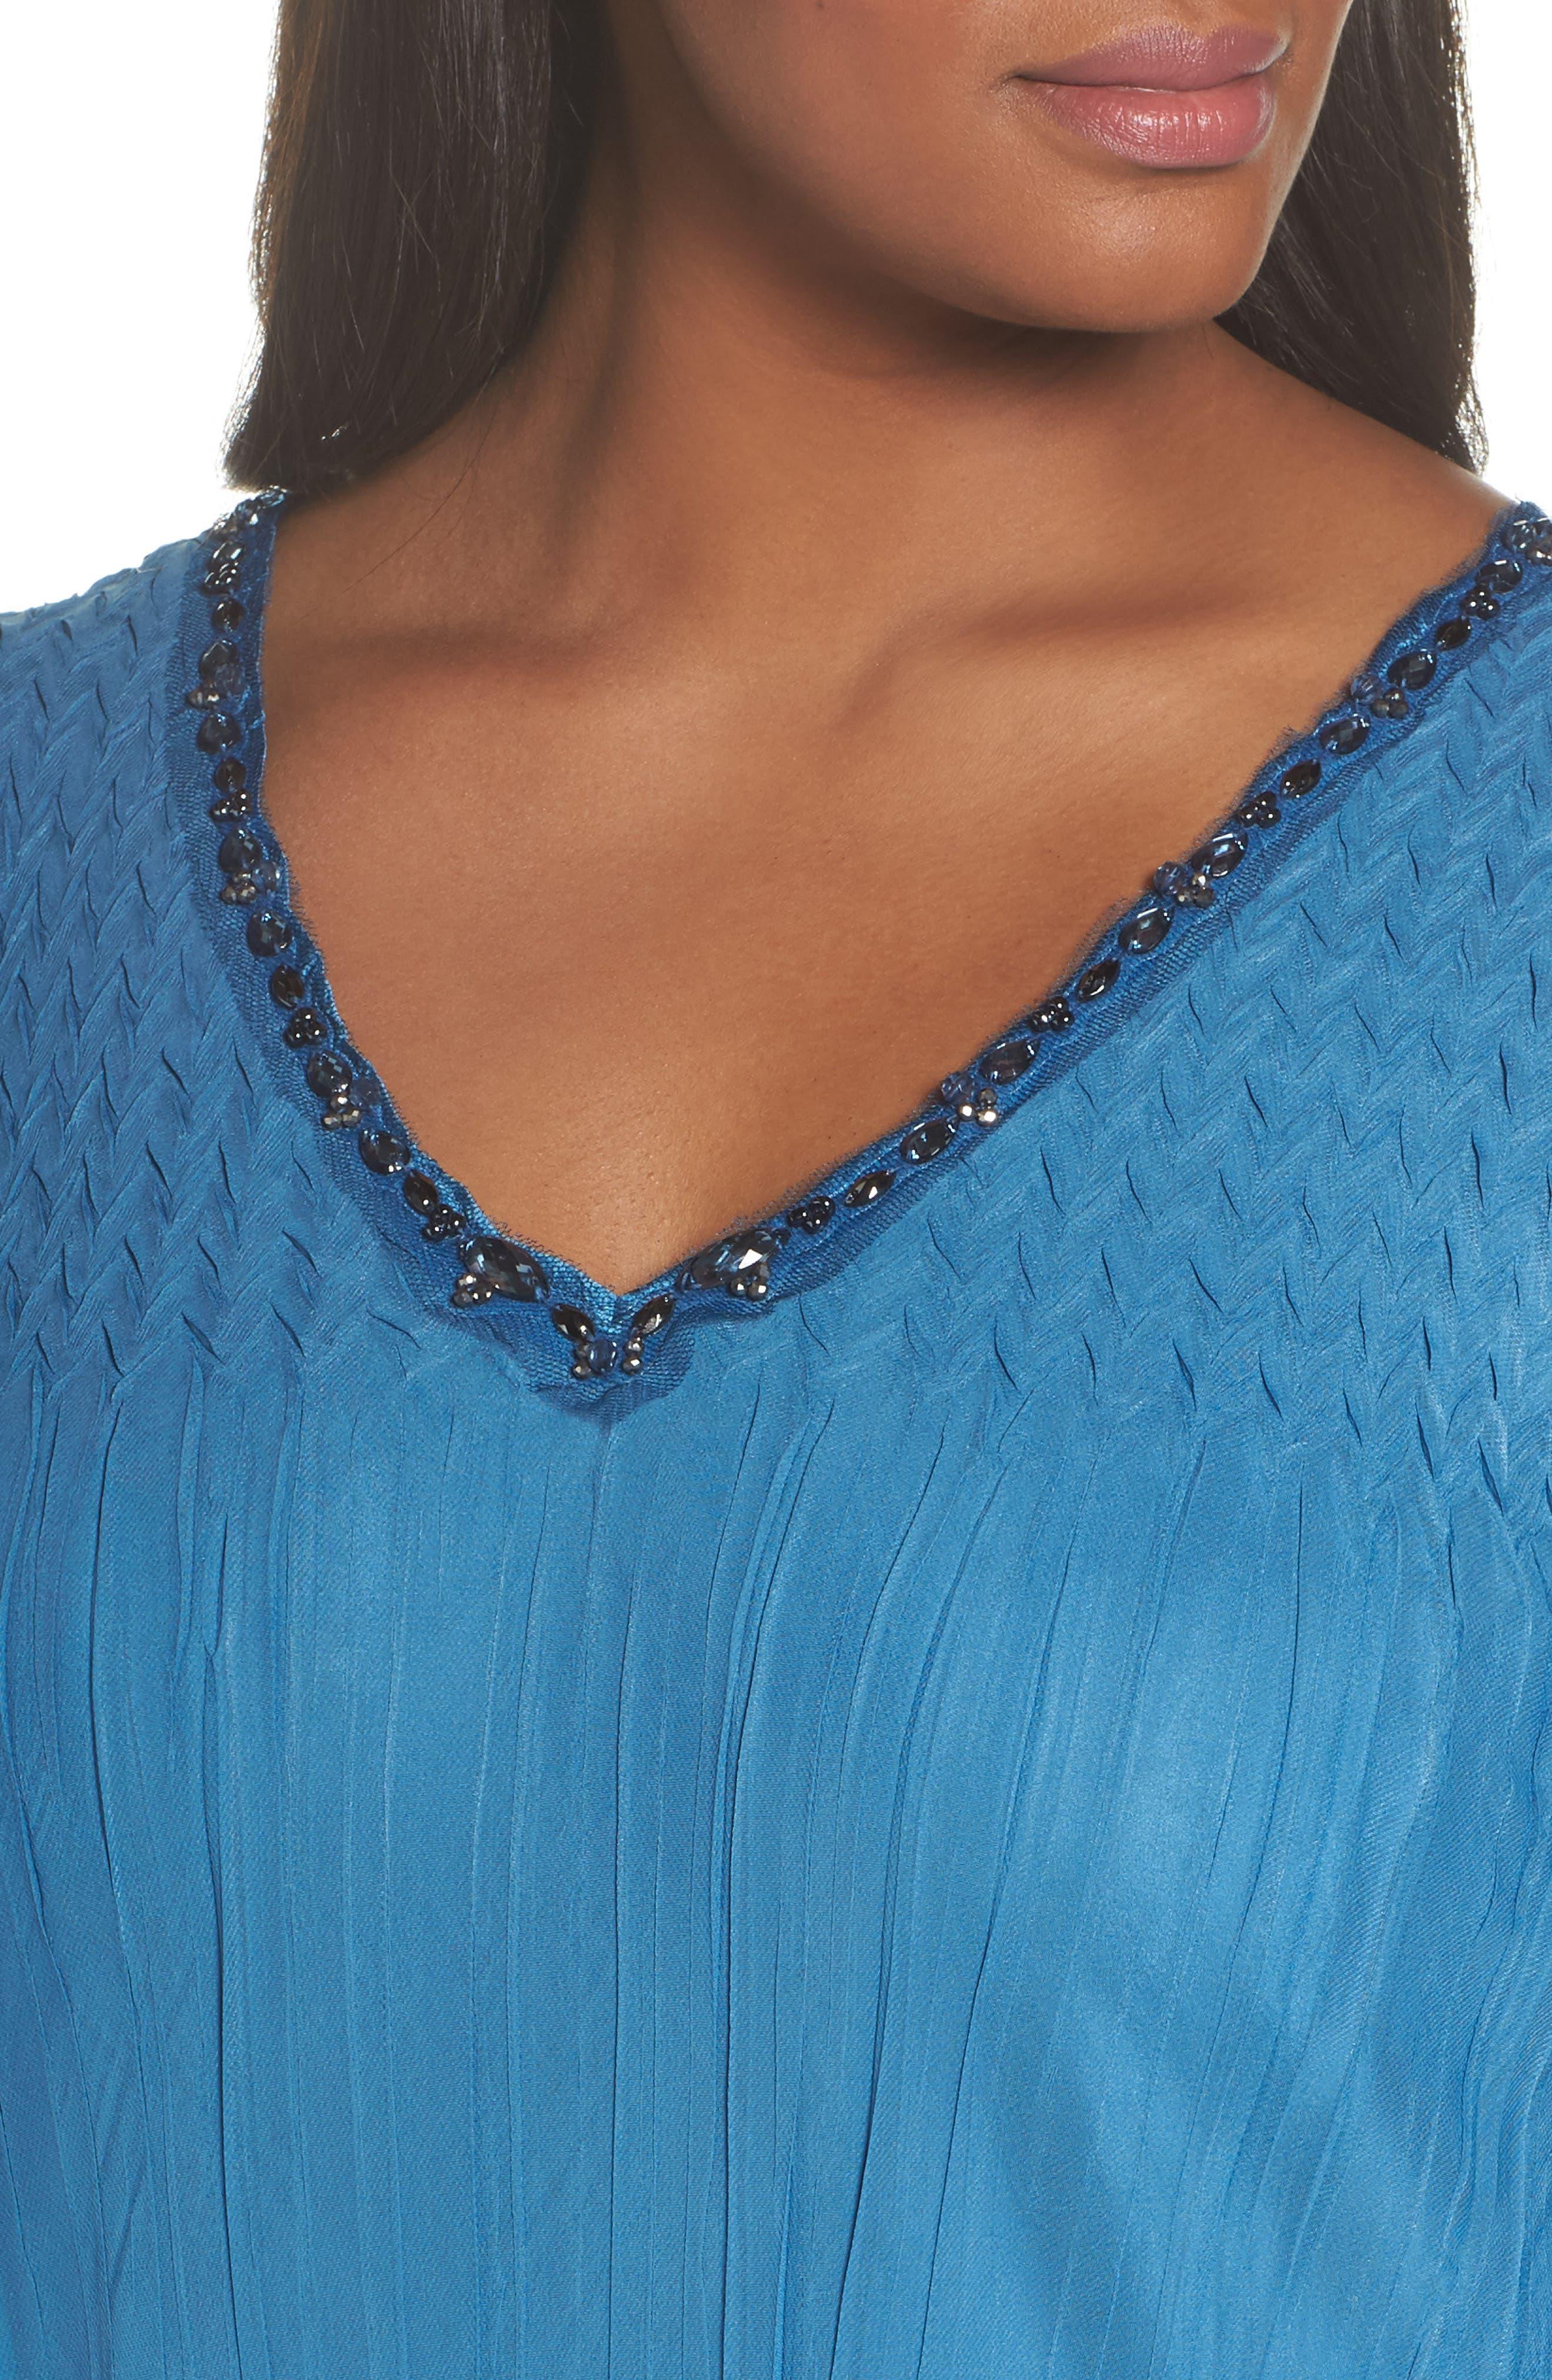 Dress Tiered Chiffon & Charmeuse Dress,                             Alternate thumbnail 4, color,                             400